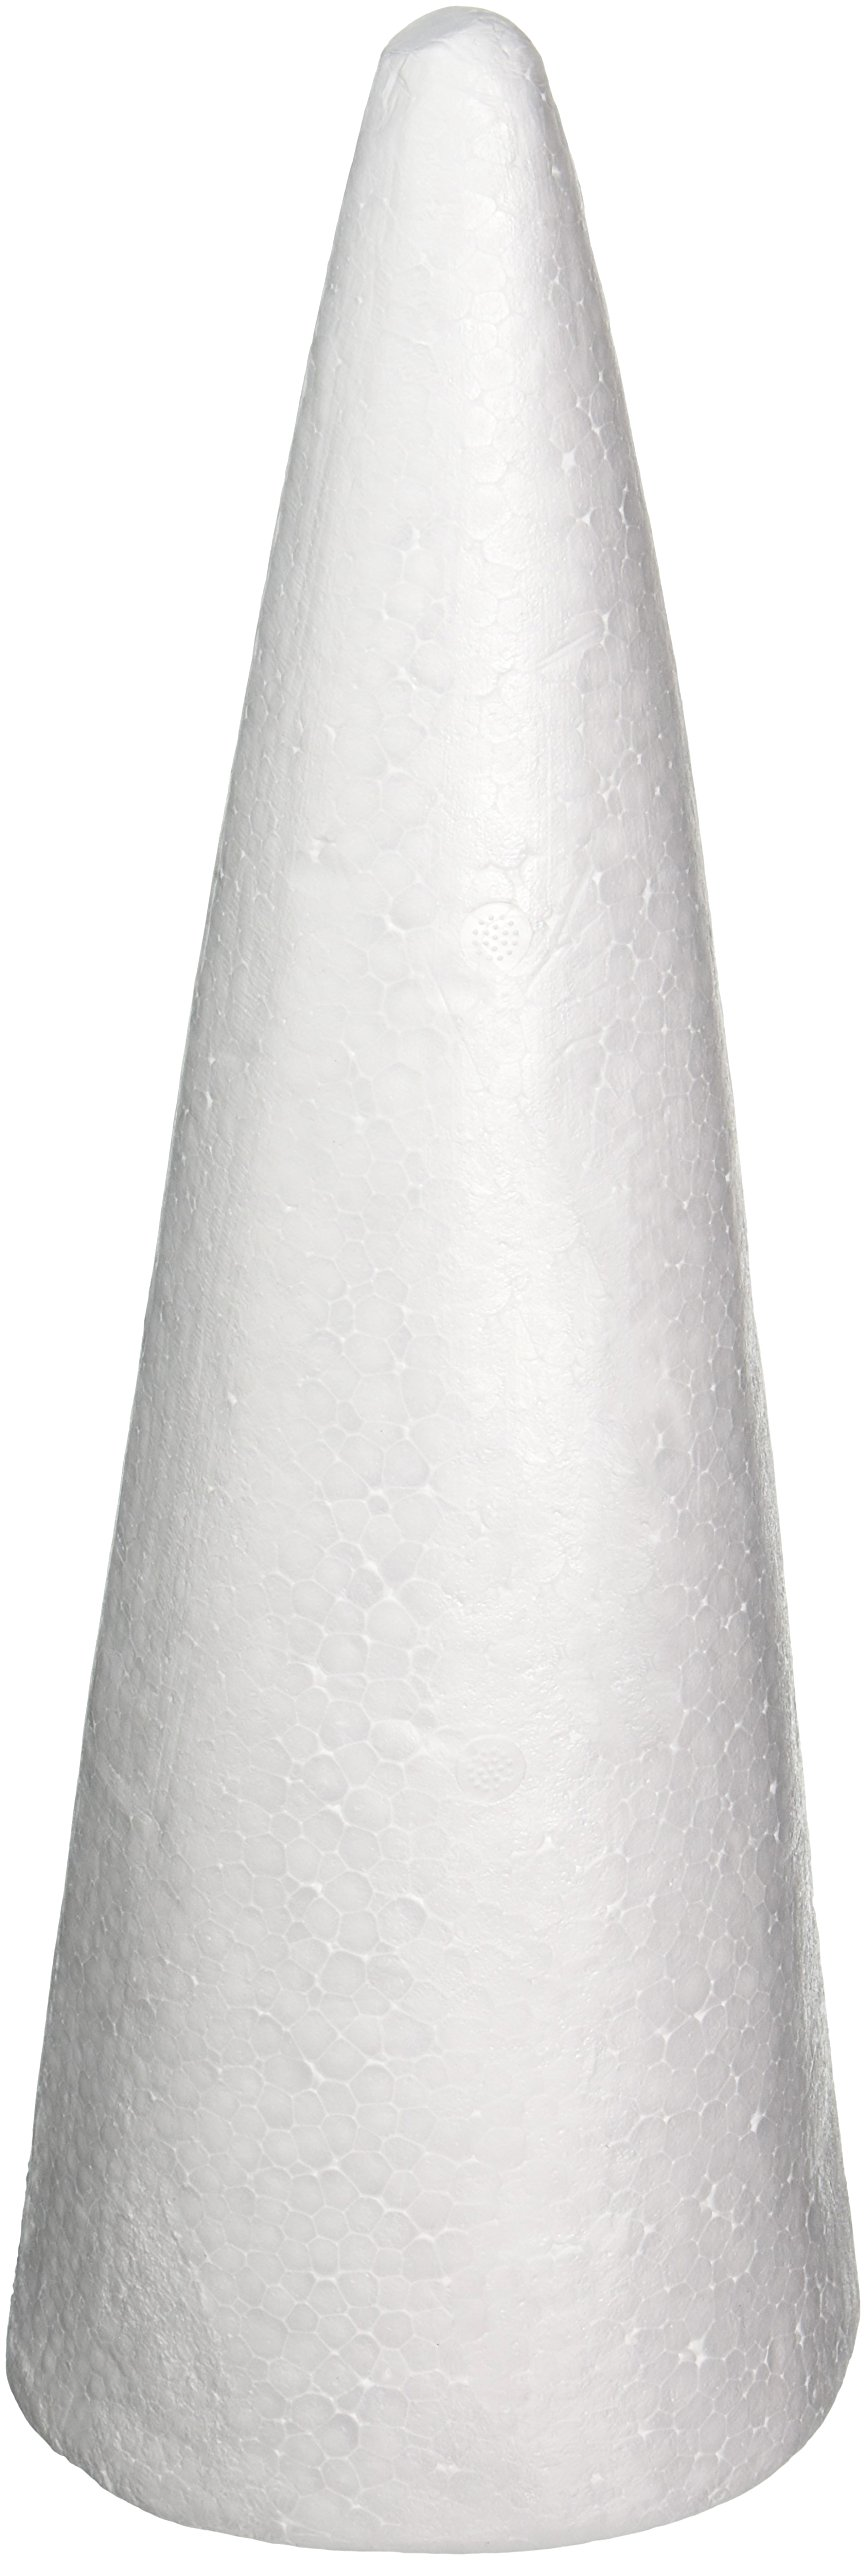 Darice 01261P 1-Piece Dura Foam Cone for Craftwork, 15-Inch product image